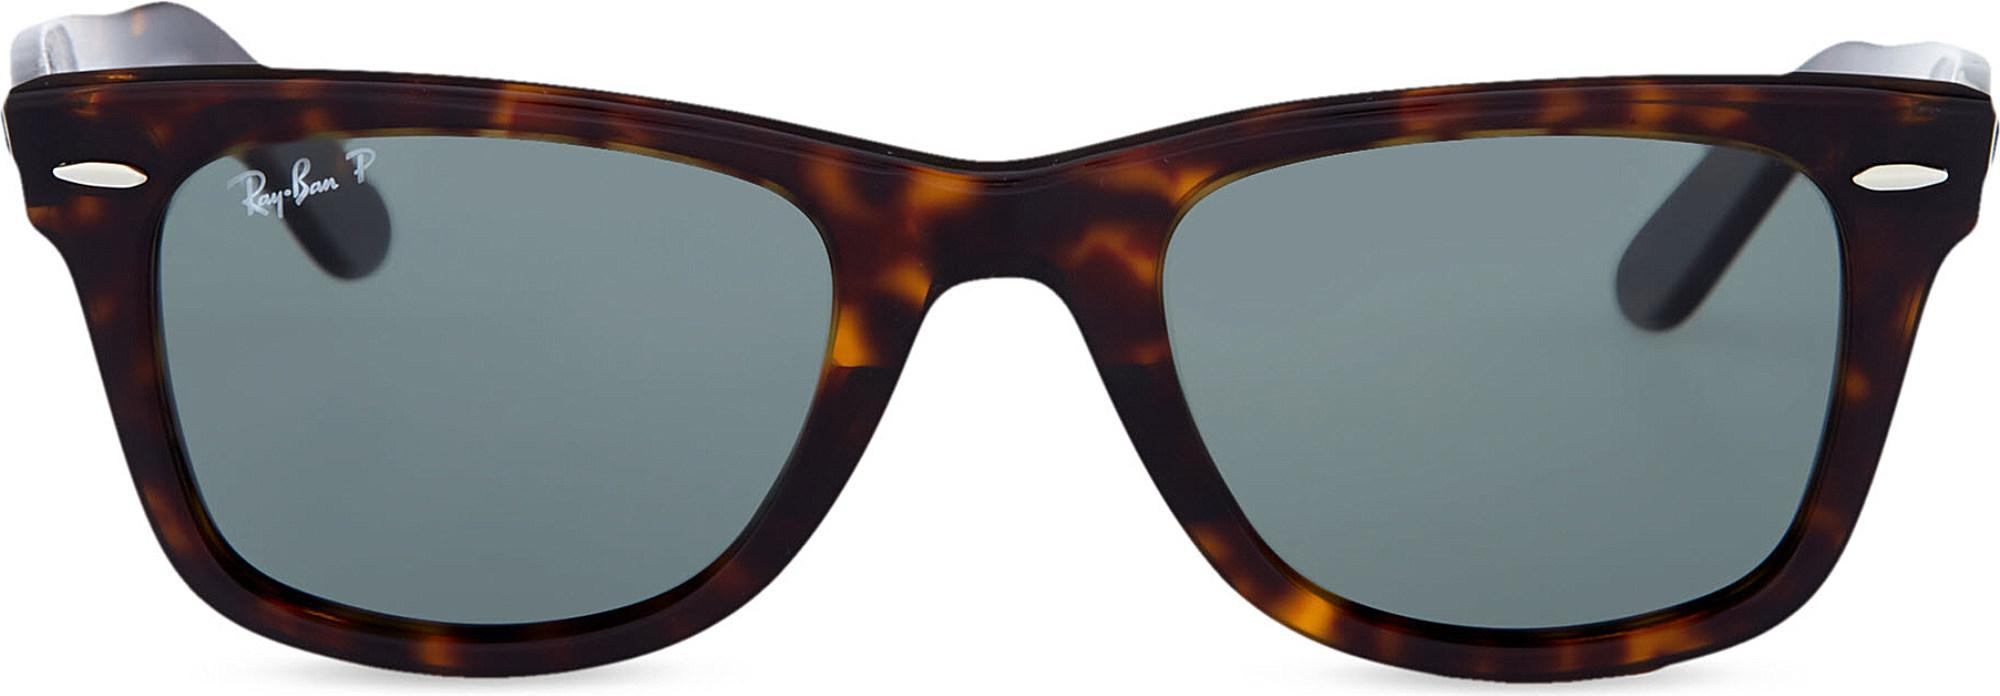 c650115711 Lyst - Ray-Ban Unisex Tortoise Effect Wayfarer Sunglasses in Brown ...